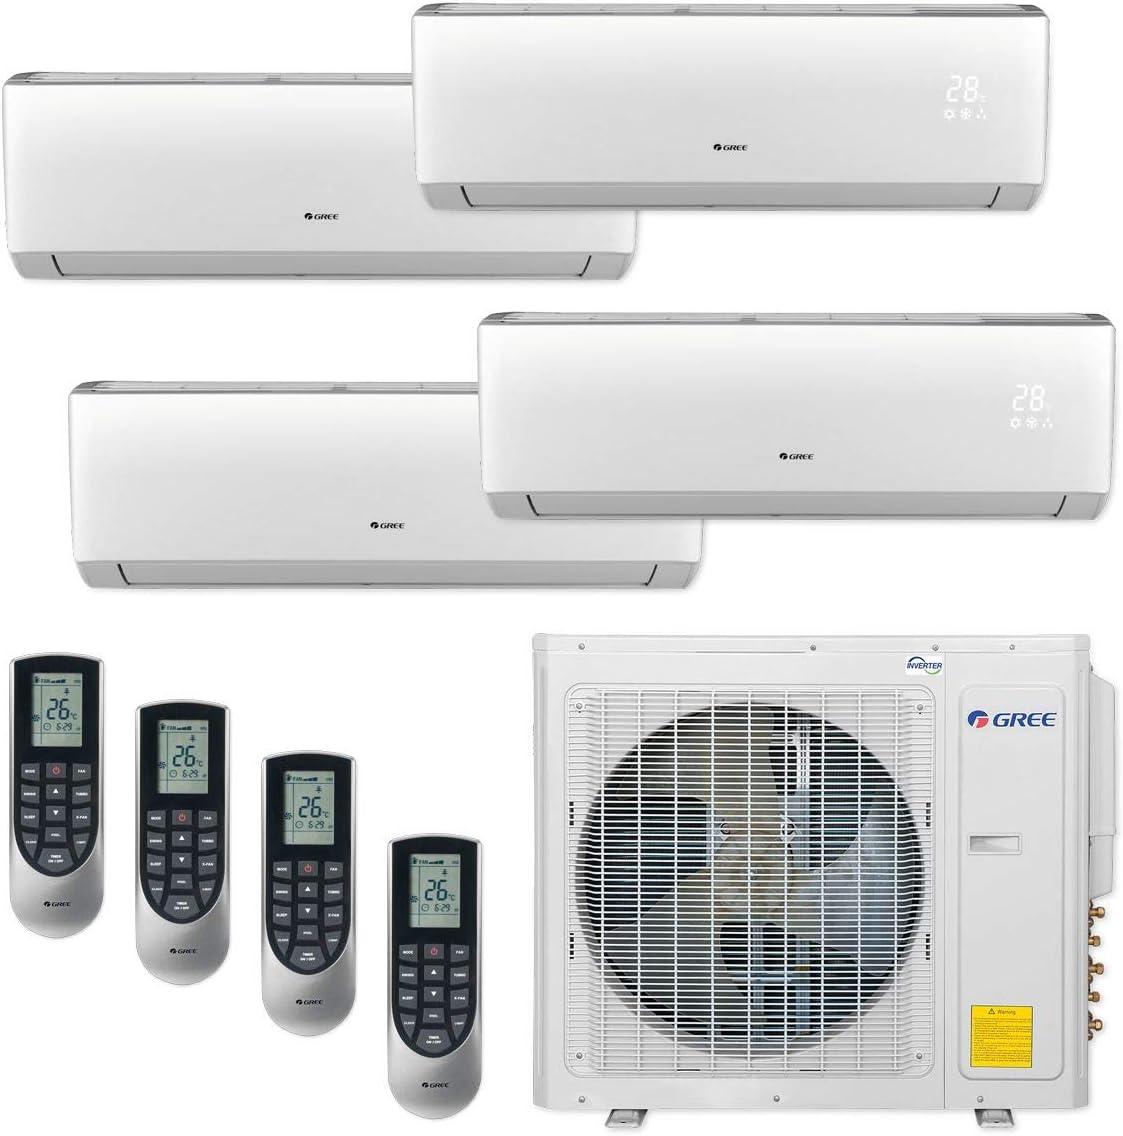 GREE MULTI30CVIR400-30,000 BTU Multi21+ Quad-Zone Wall Mount Mini Split Air Conditioner Heat Pump 208-230V (9-9-9-9)